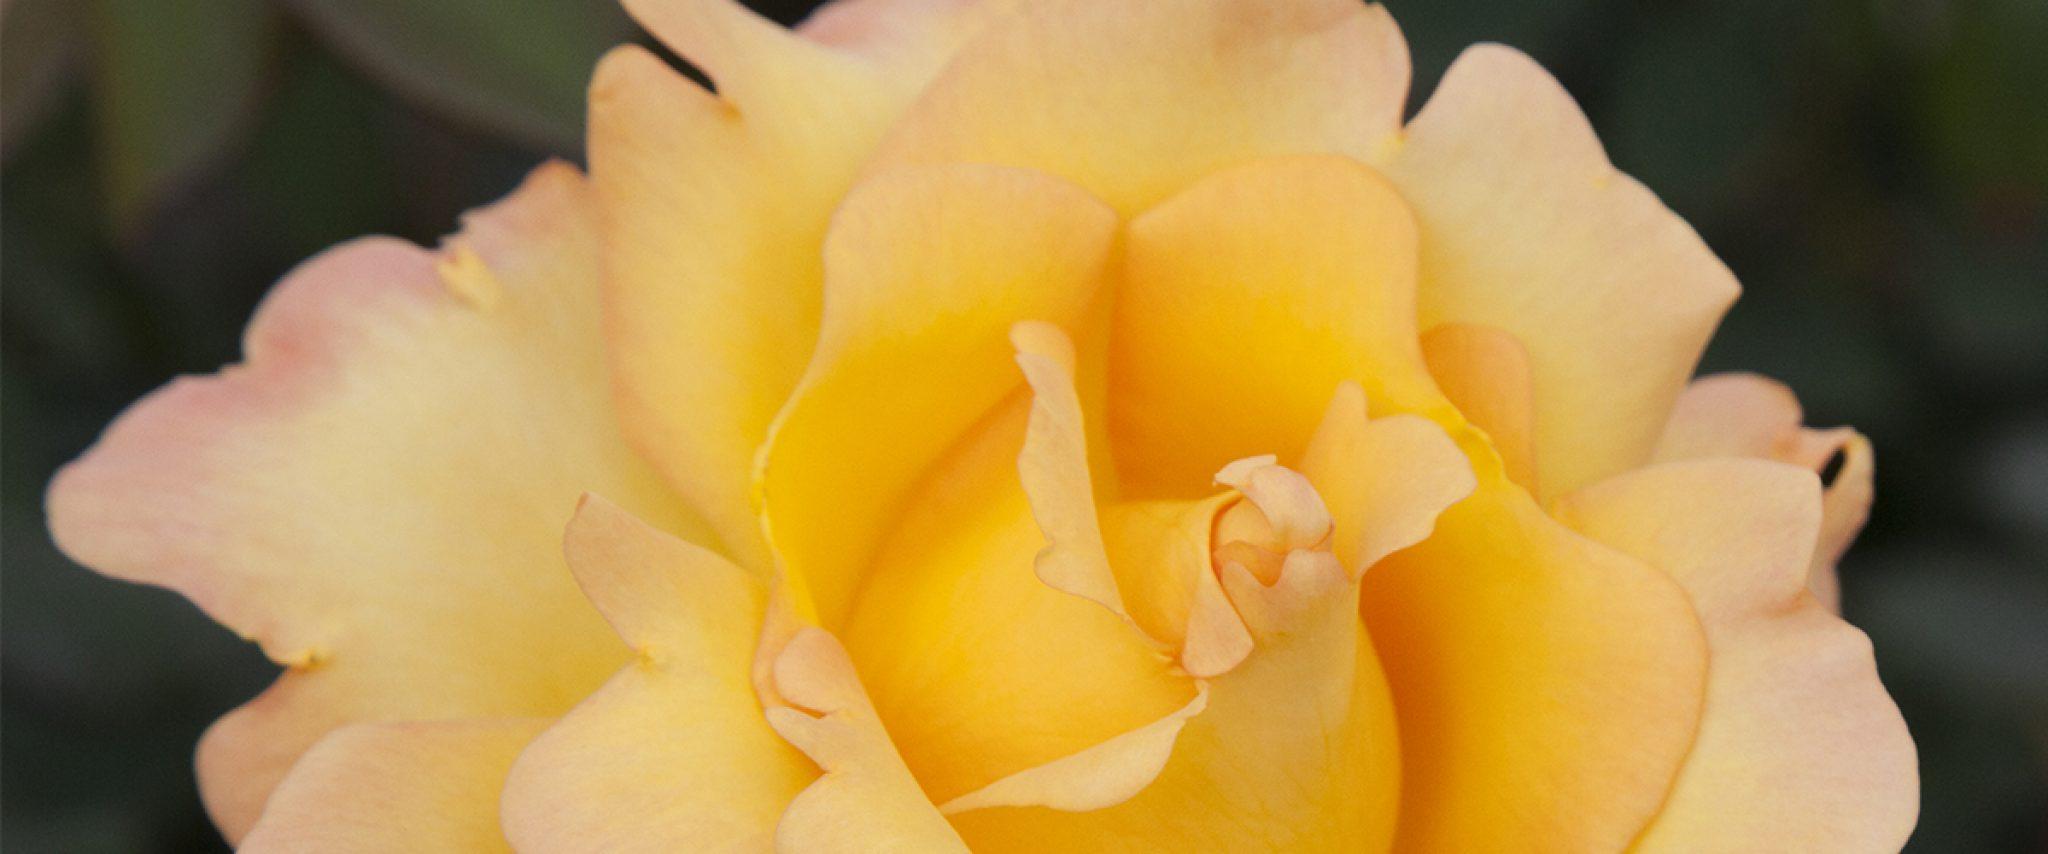 goldgrandiflora1200x500-1024x427@2x